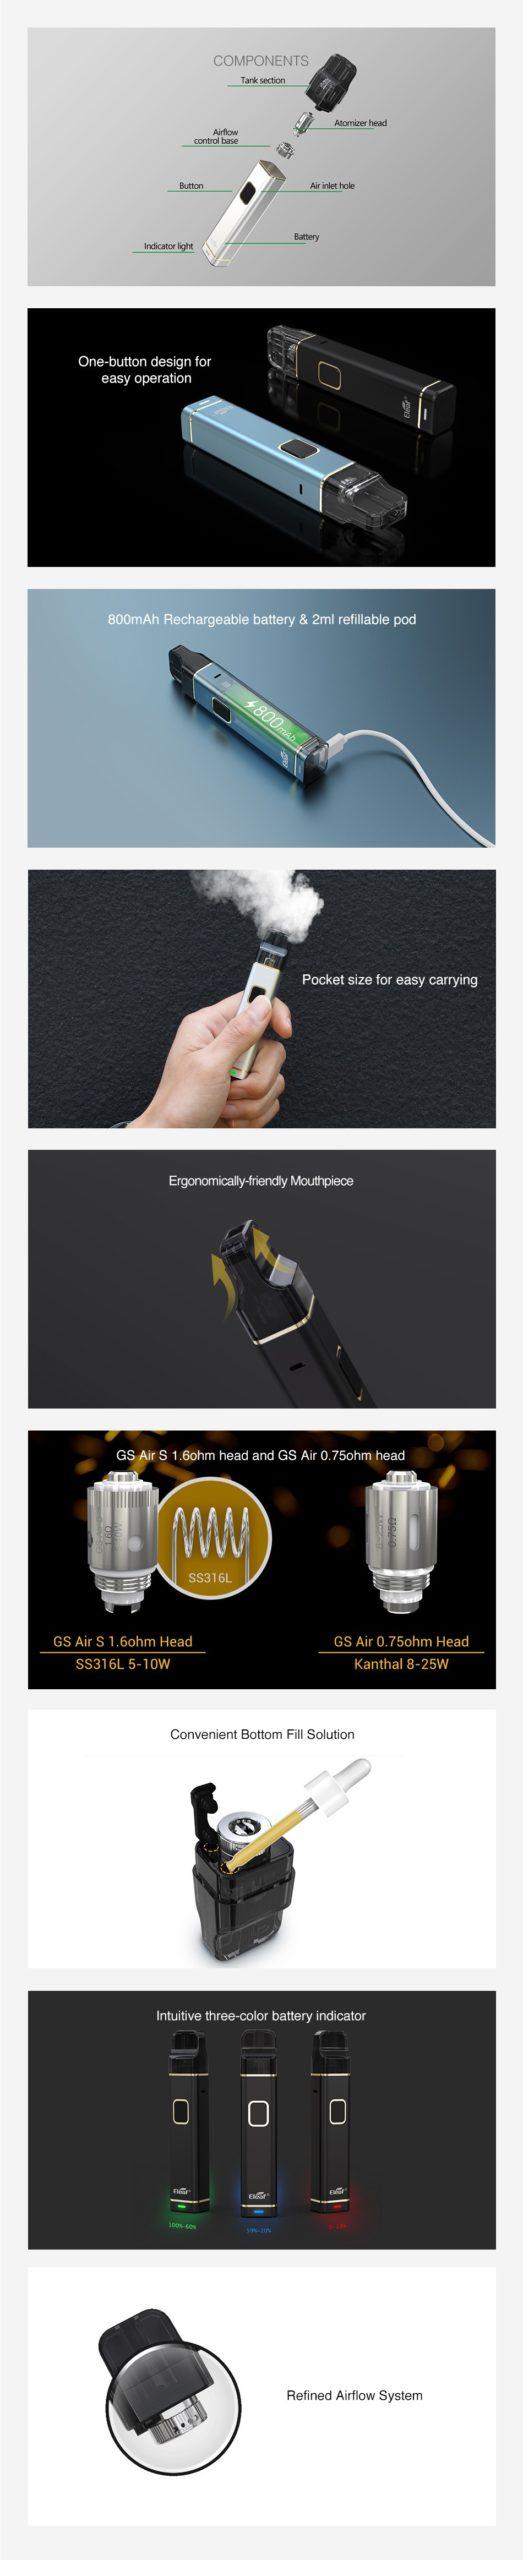 Eleaf iTap Pod Starter Kit 800mAh